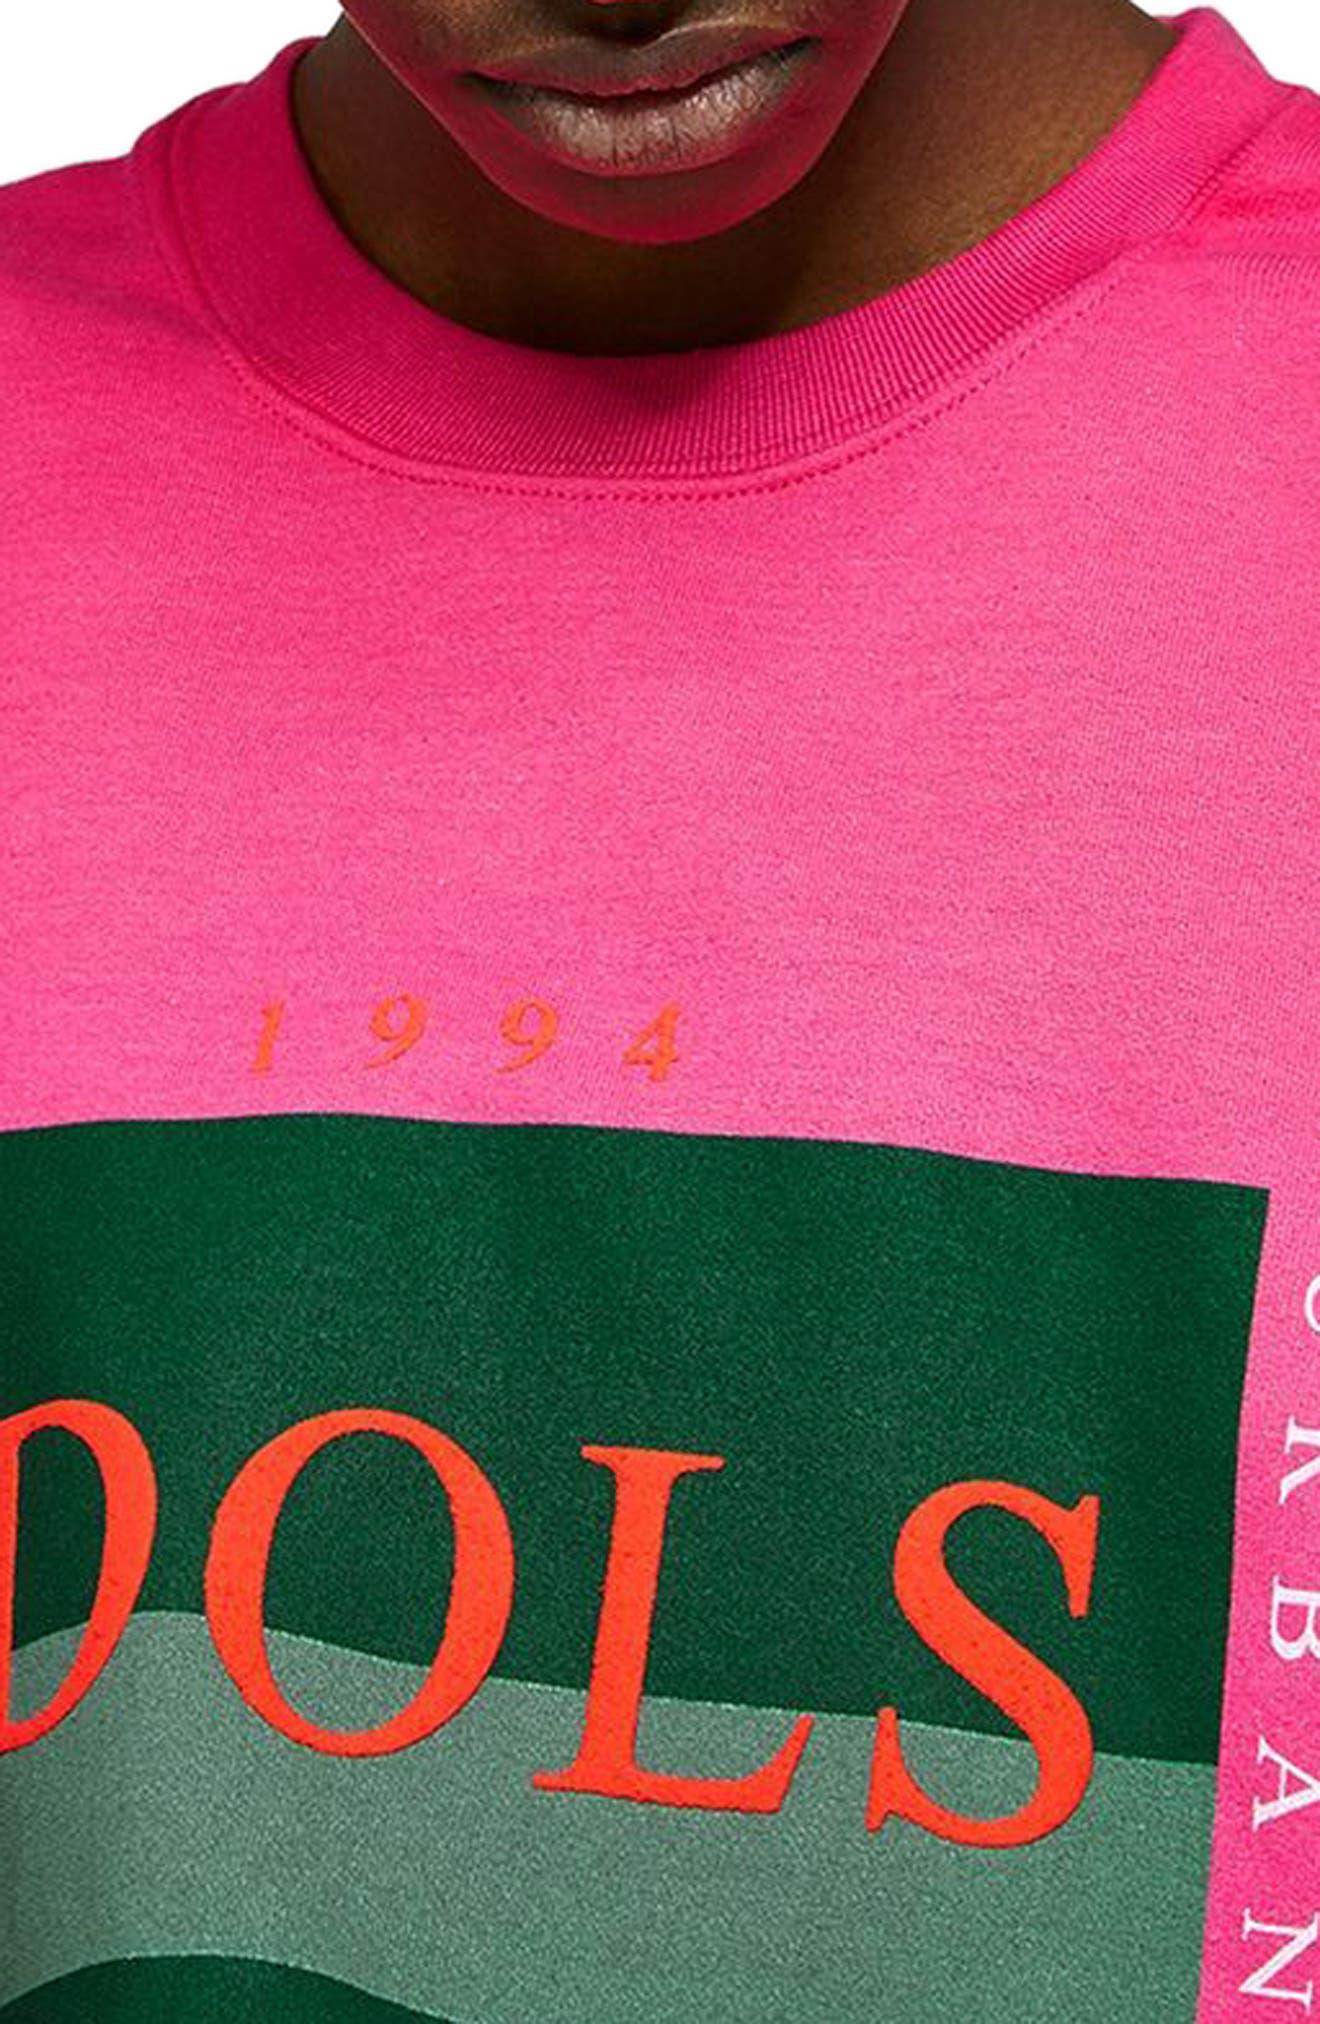 Urban Idols Graphic Sweatshirt,                             Alternate thumbnail 3, color,                             650